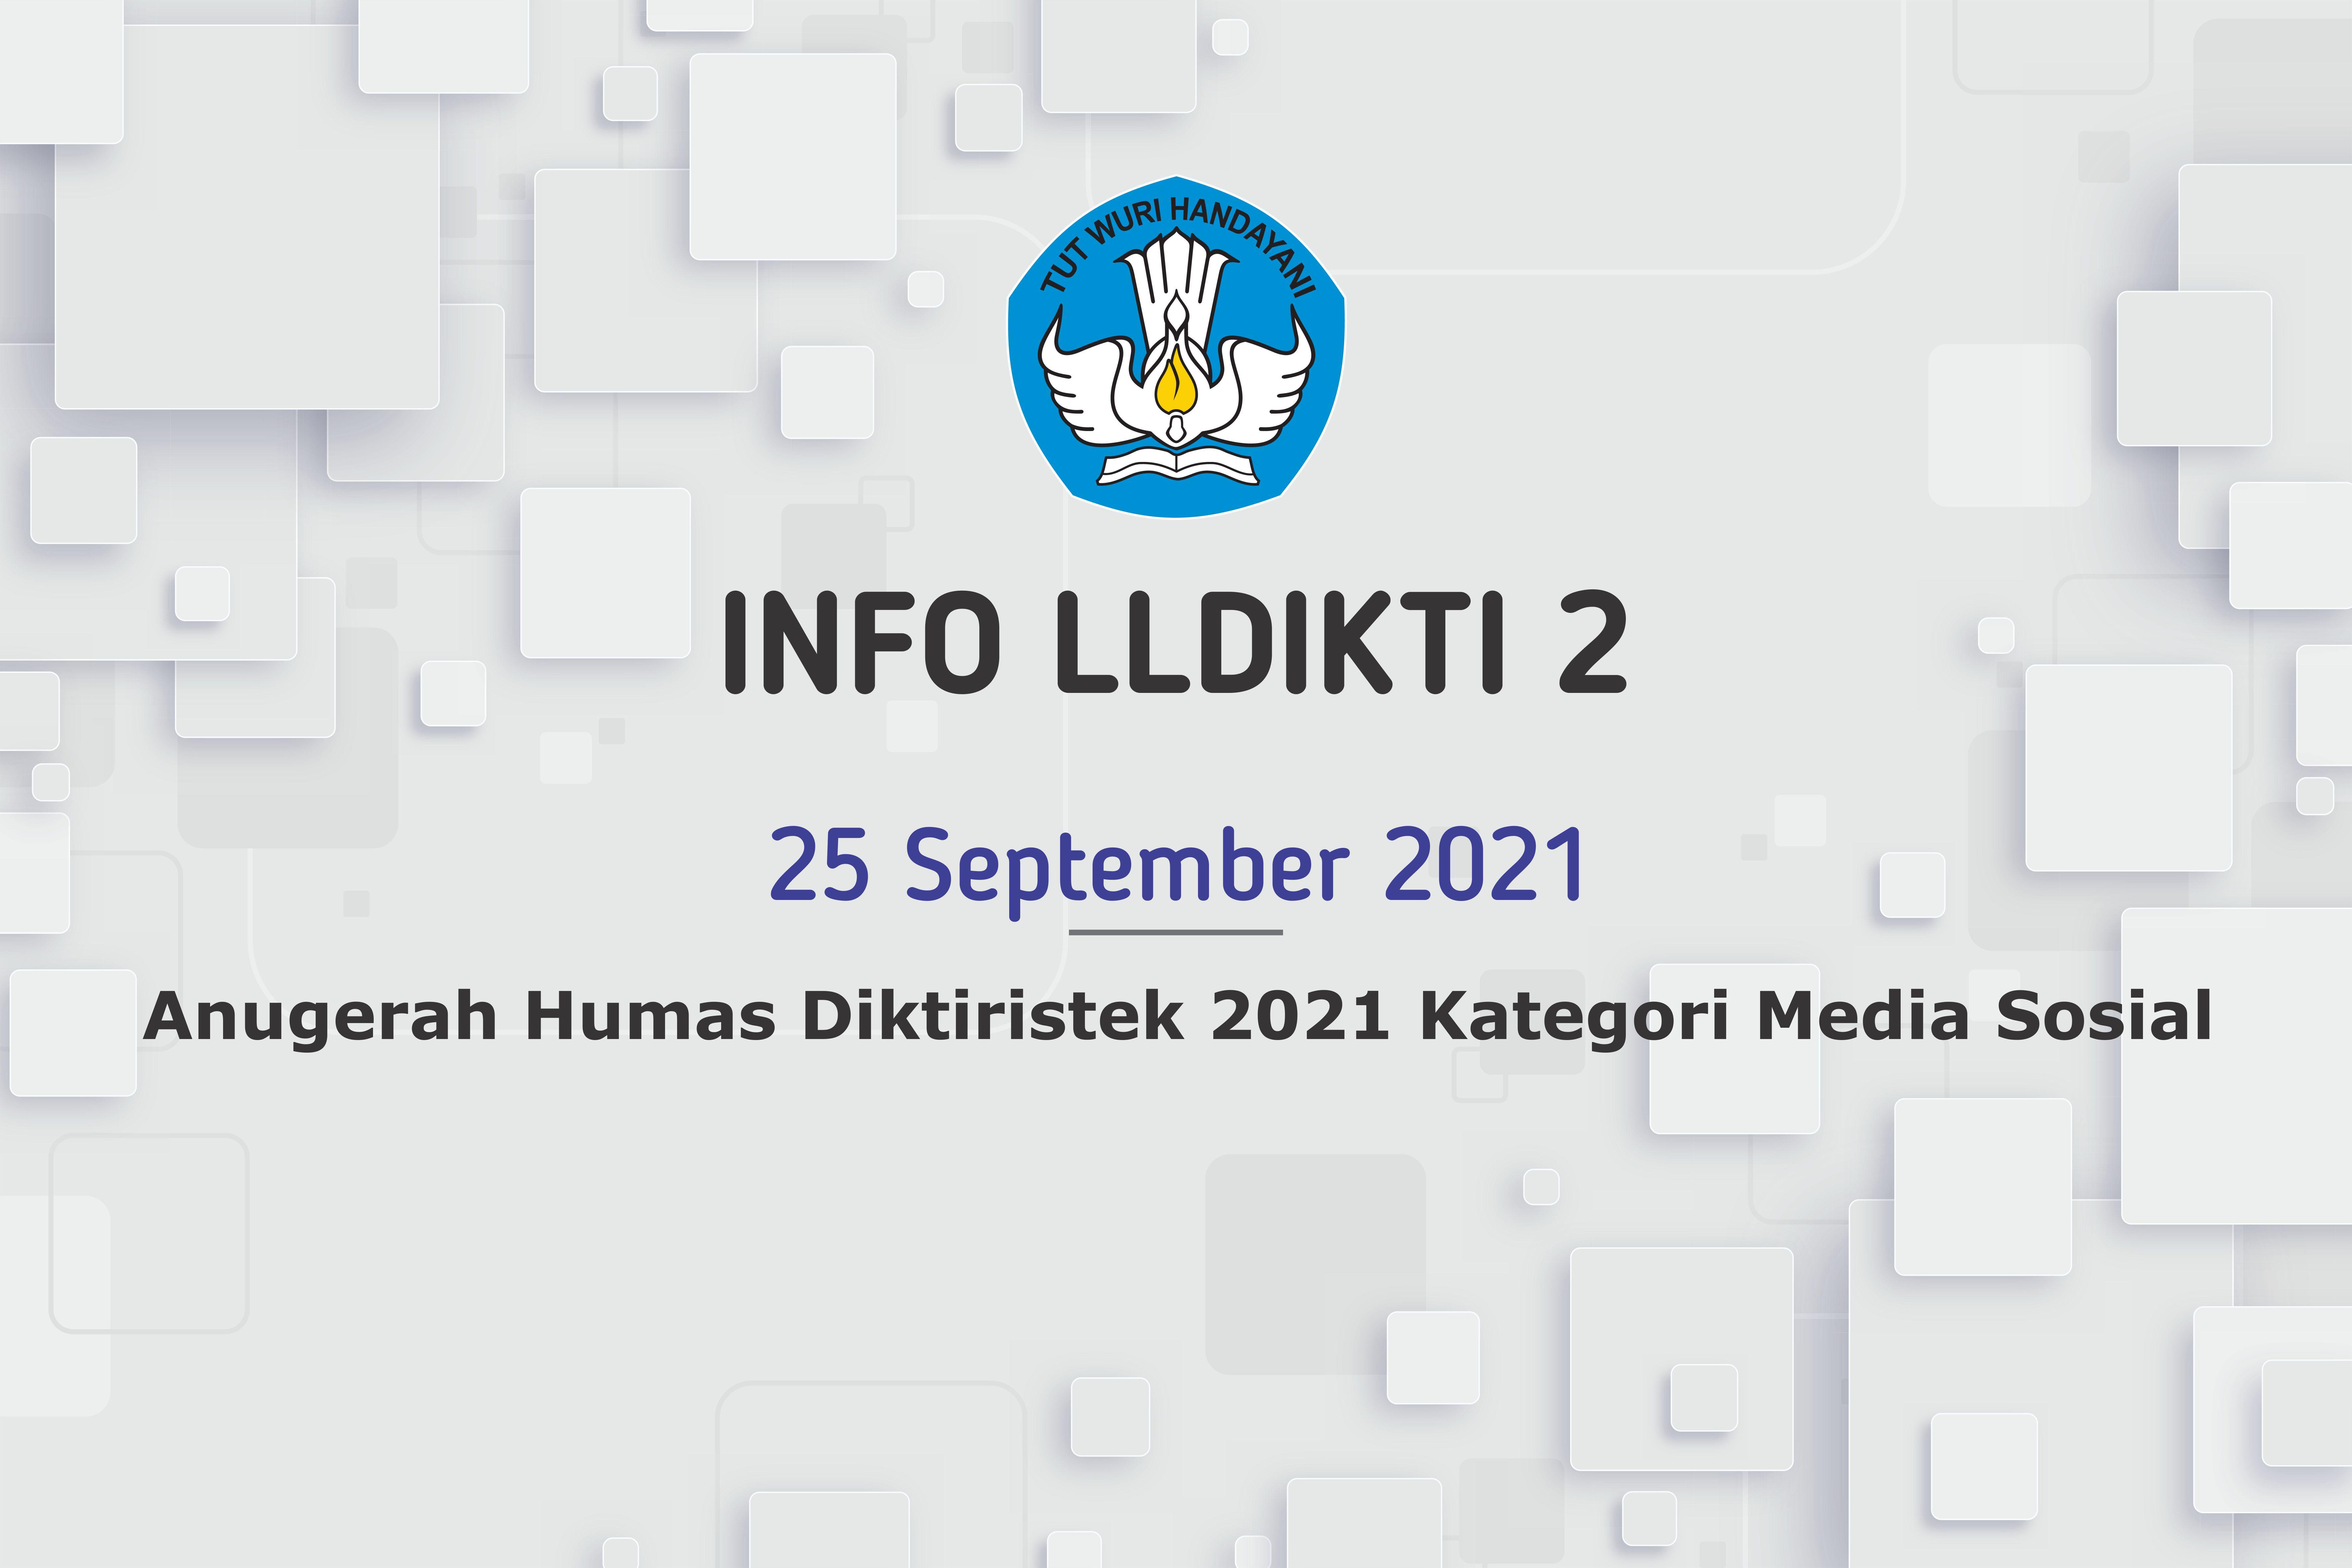 Anugerah Humas Diktiristek 2021 Kategori Media Sosial